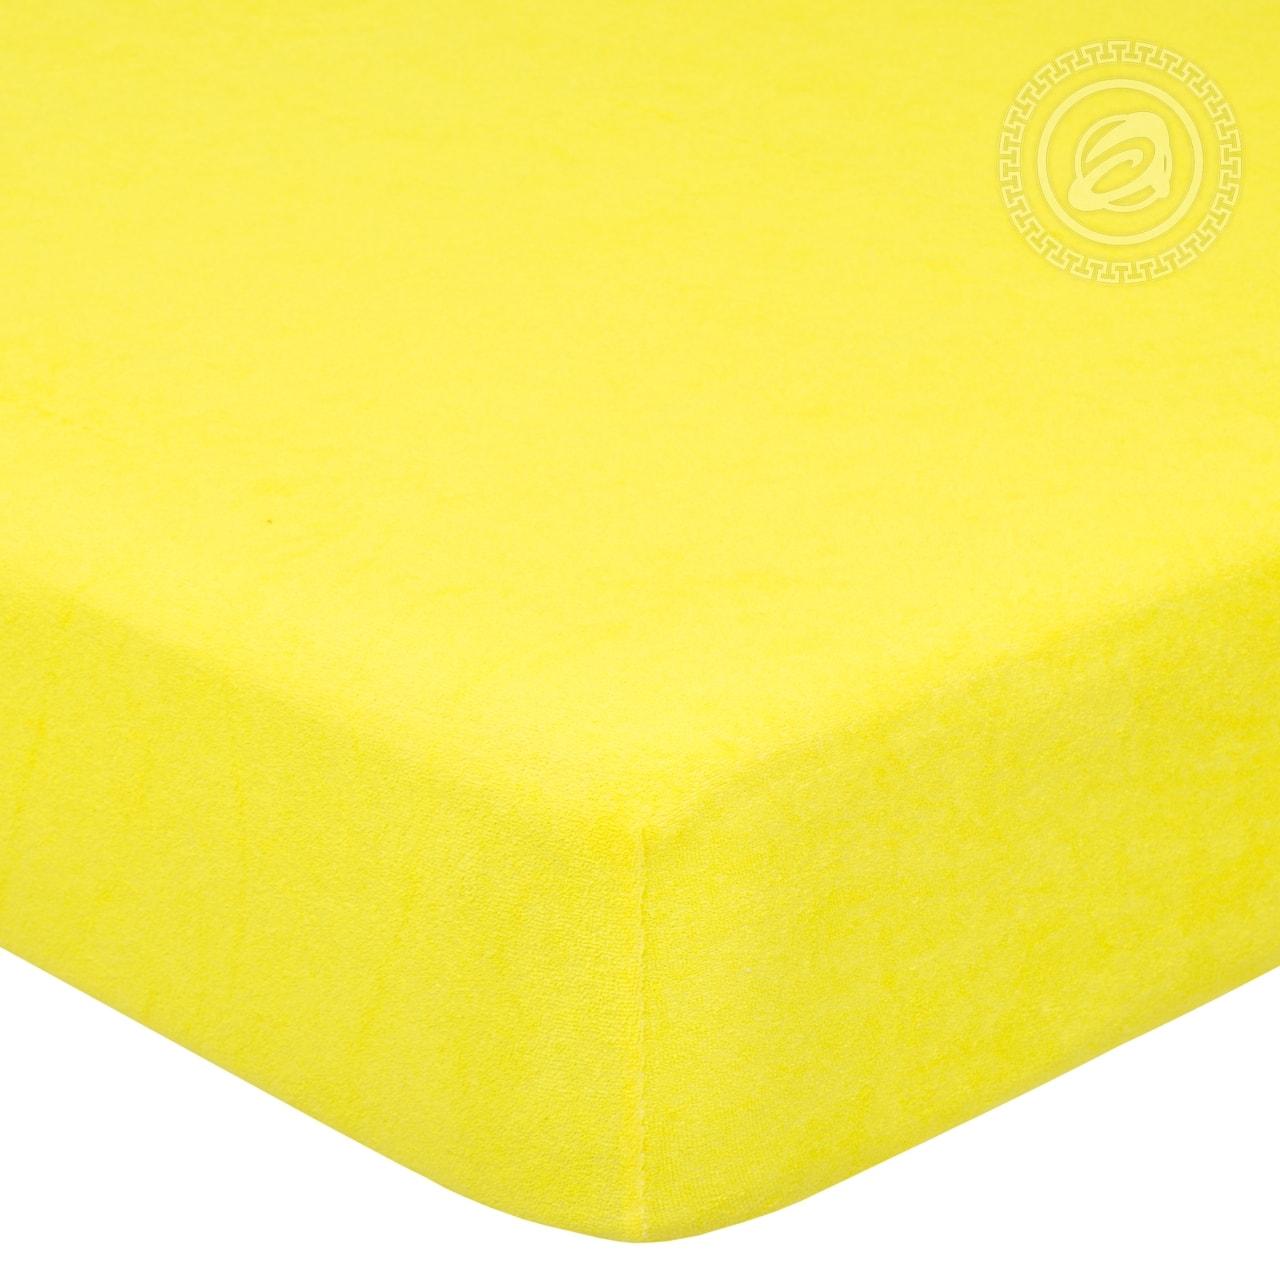 Простыня на резинке Лимон (махра) (60х120) простыня на резинке ирис размер 60х120 см